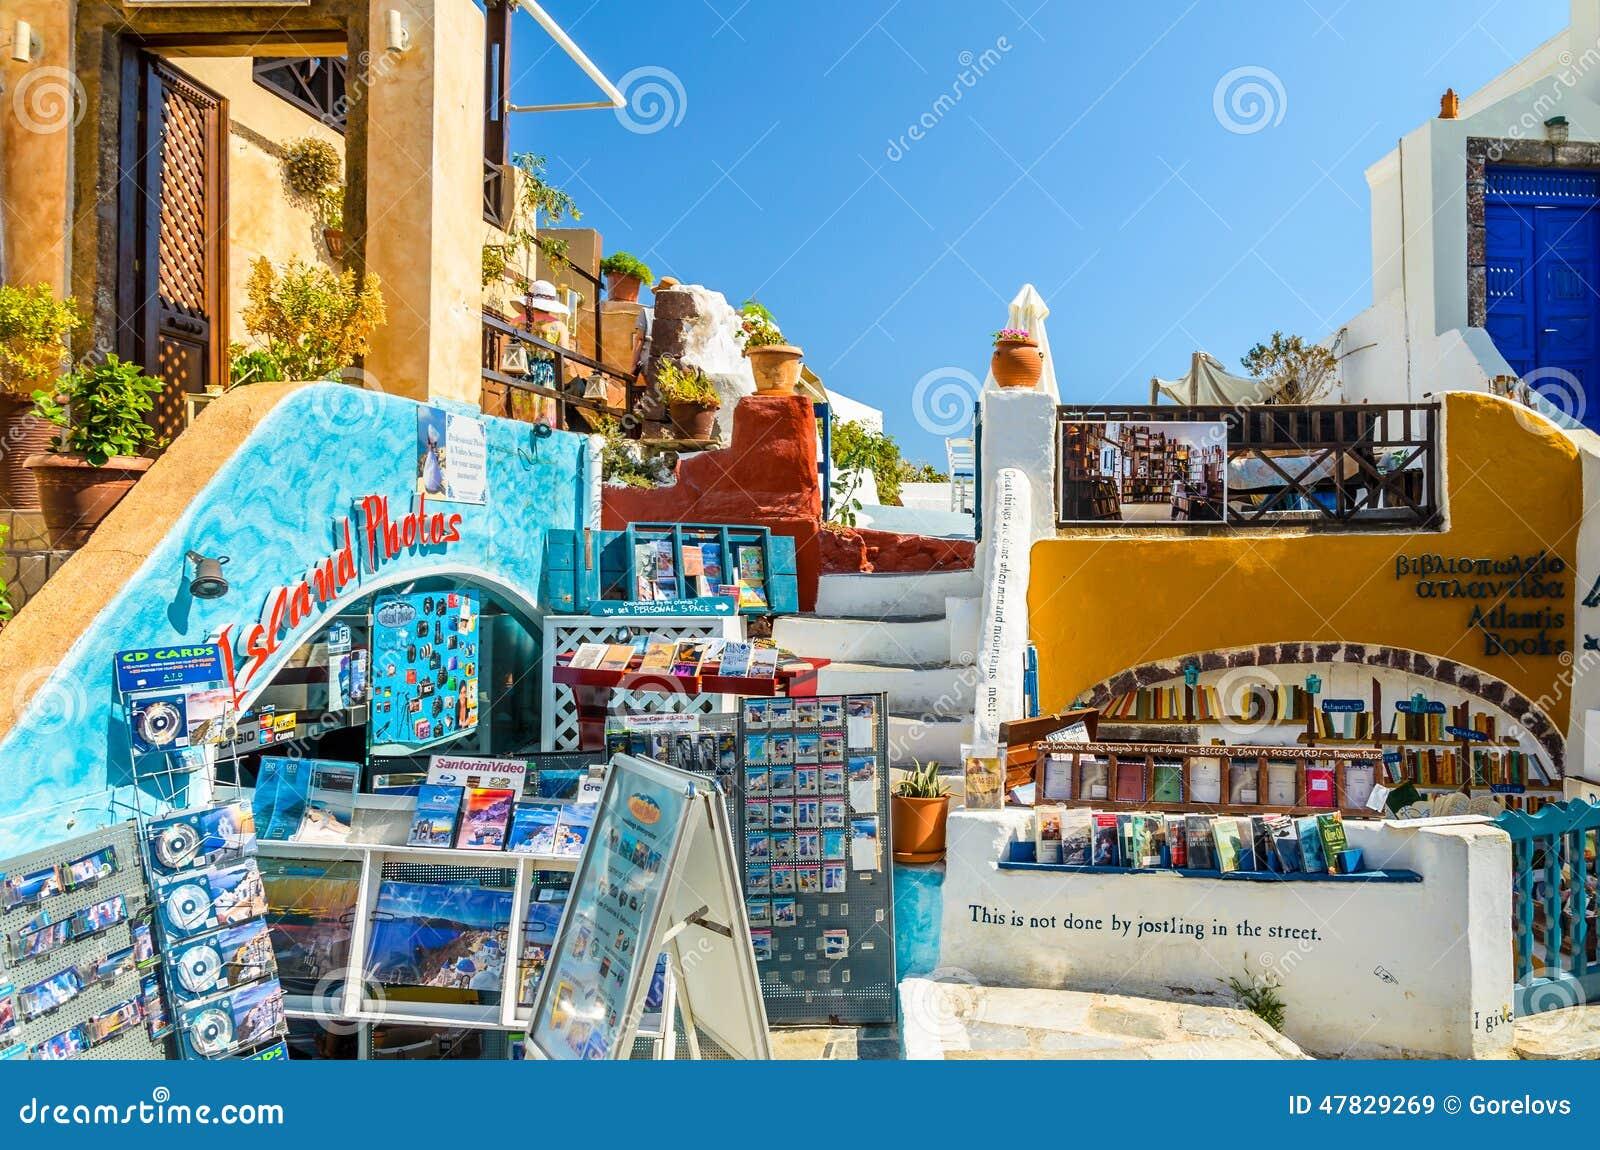 Traditional Santorini S Buildings And Souvenir Shop Editorial Stock Image Image 47829269